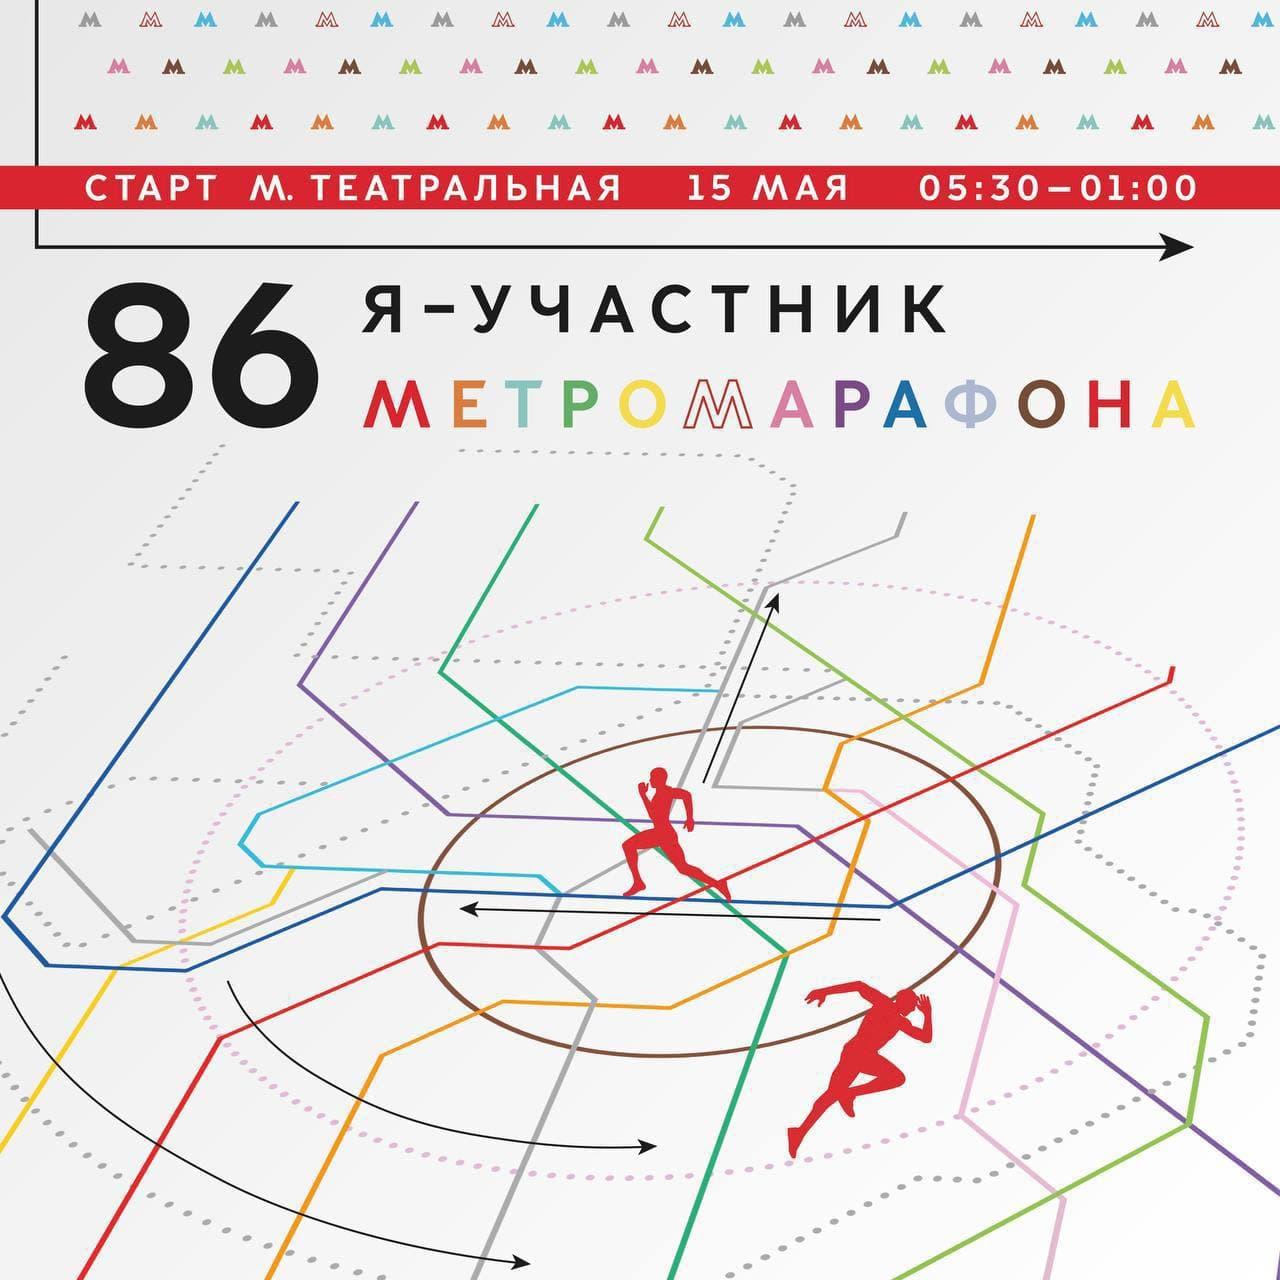 метромарафон